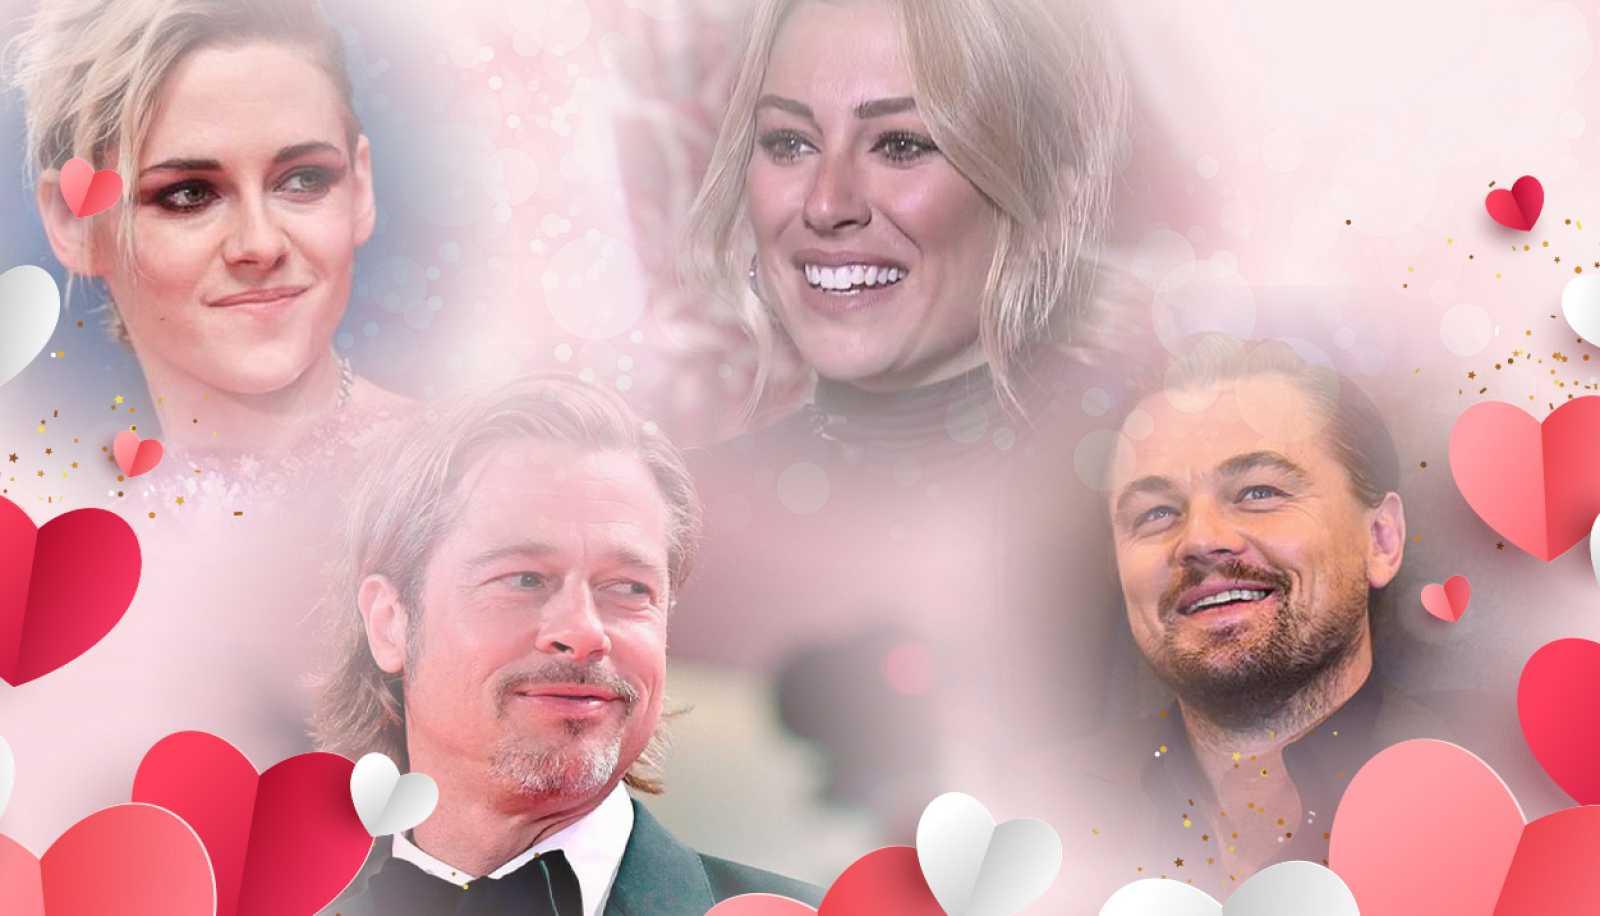 Corazón - Collage San Valentín